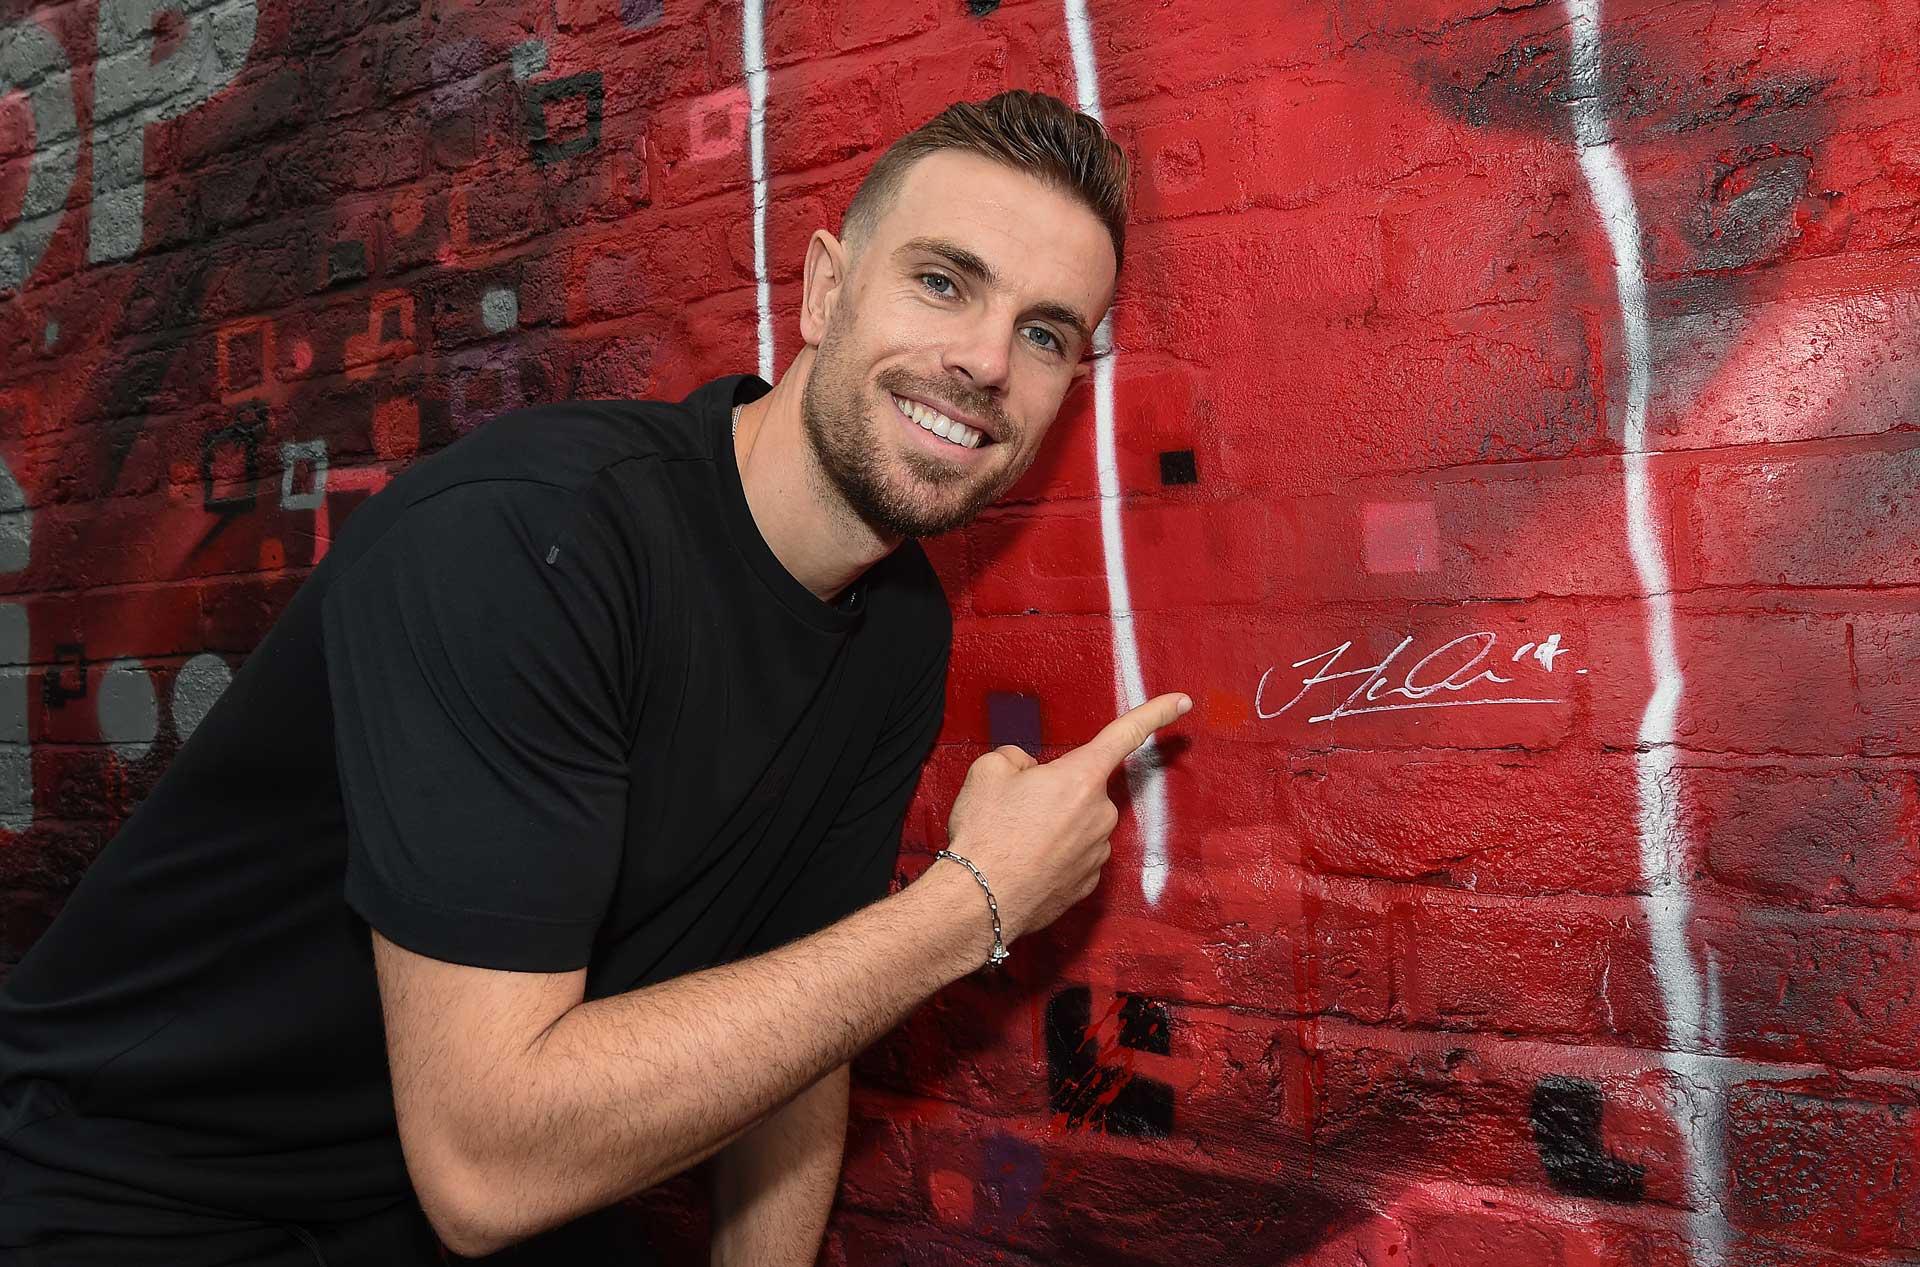 047-Jordan-Henderson-Hendo-autograph-Mural-lfc-premiership-champions